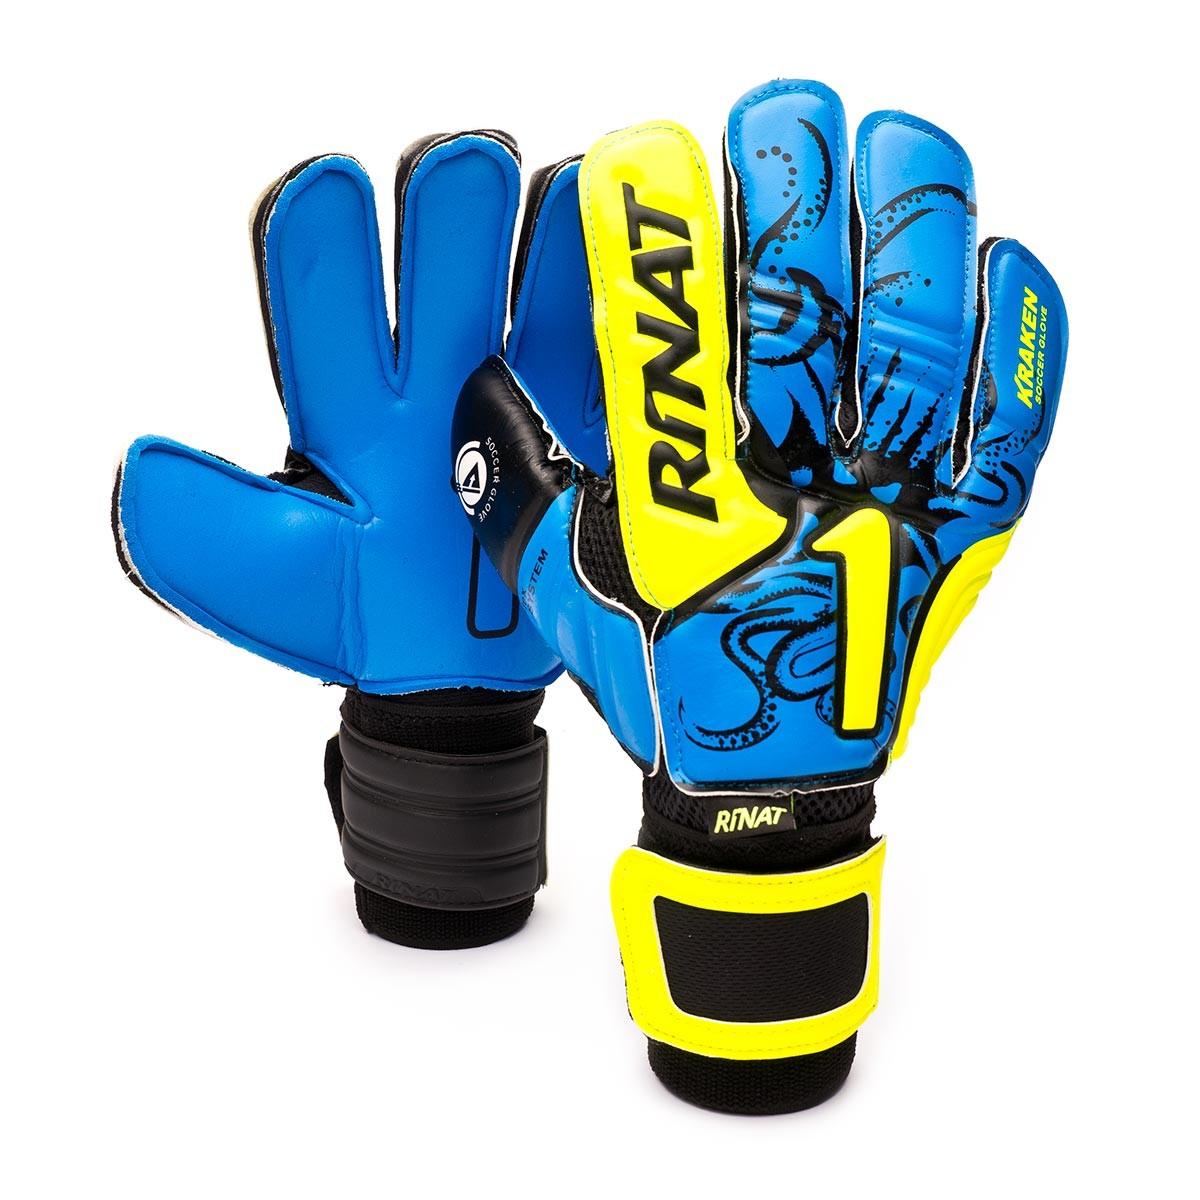 4df3be25d Glove Rinat Kraken NRG Neo Semi Blue-Black - Football store Fútbol Emotion